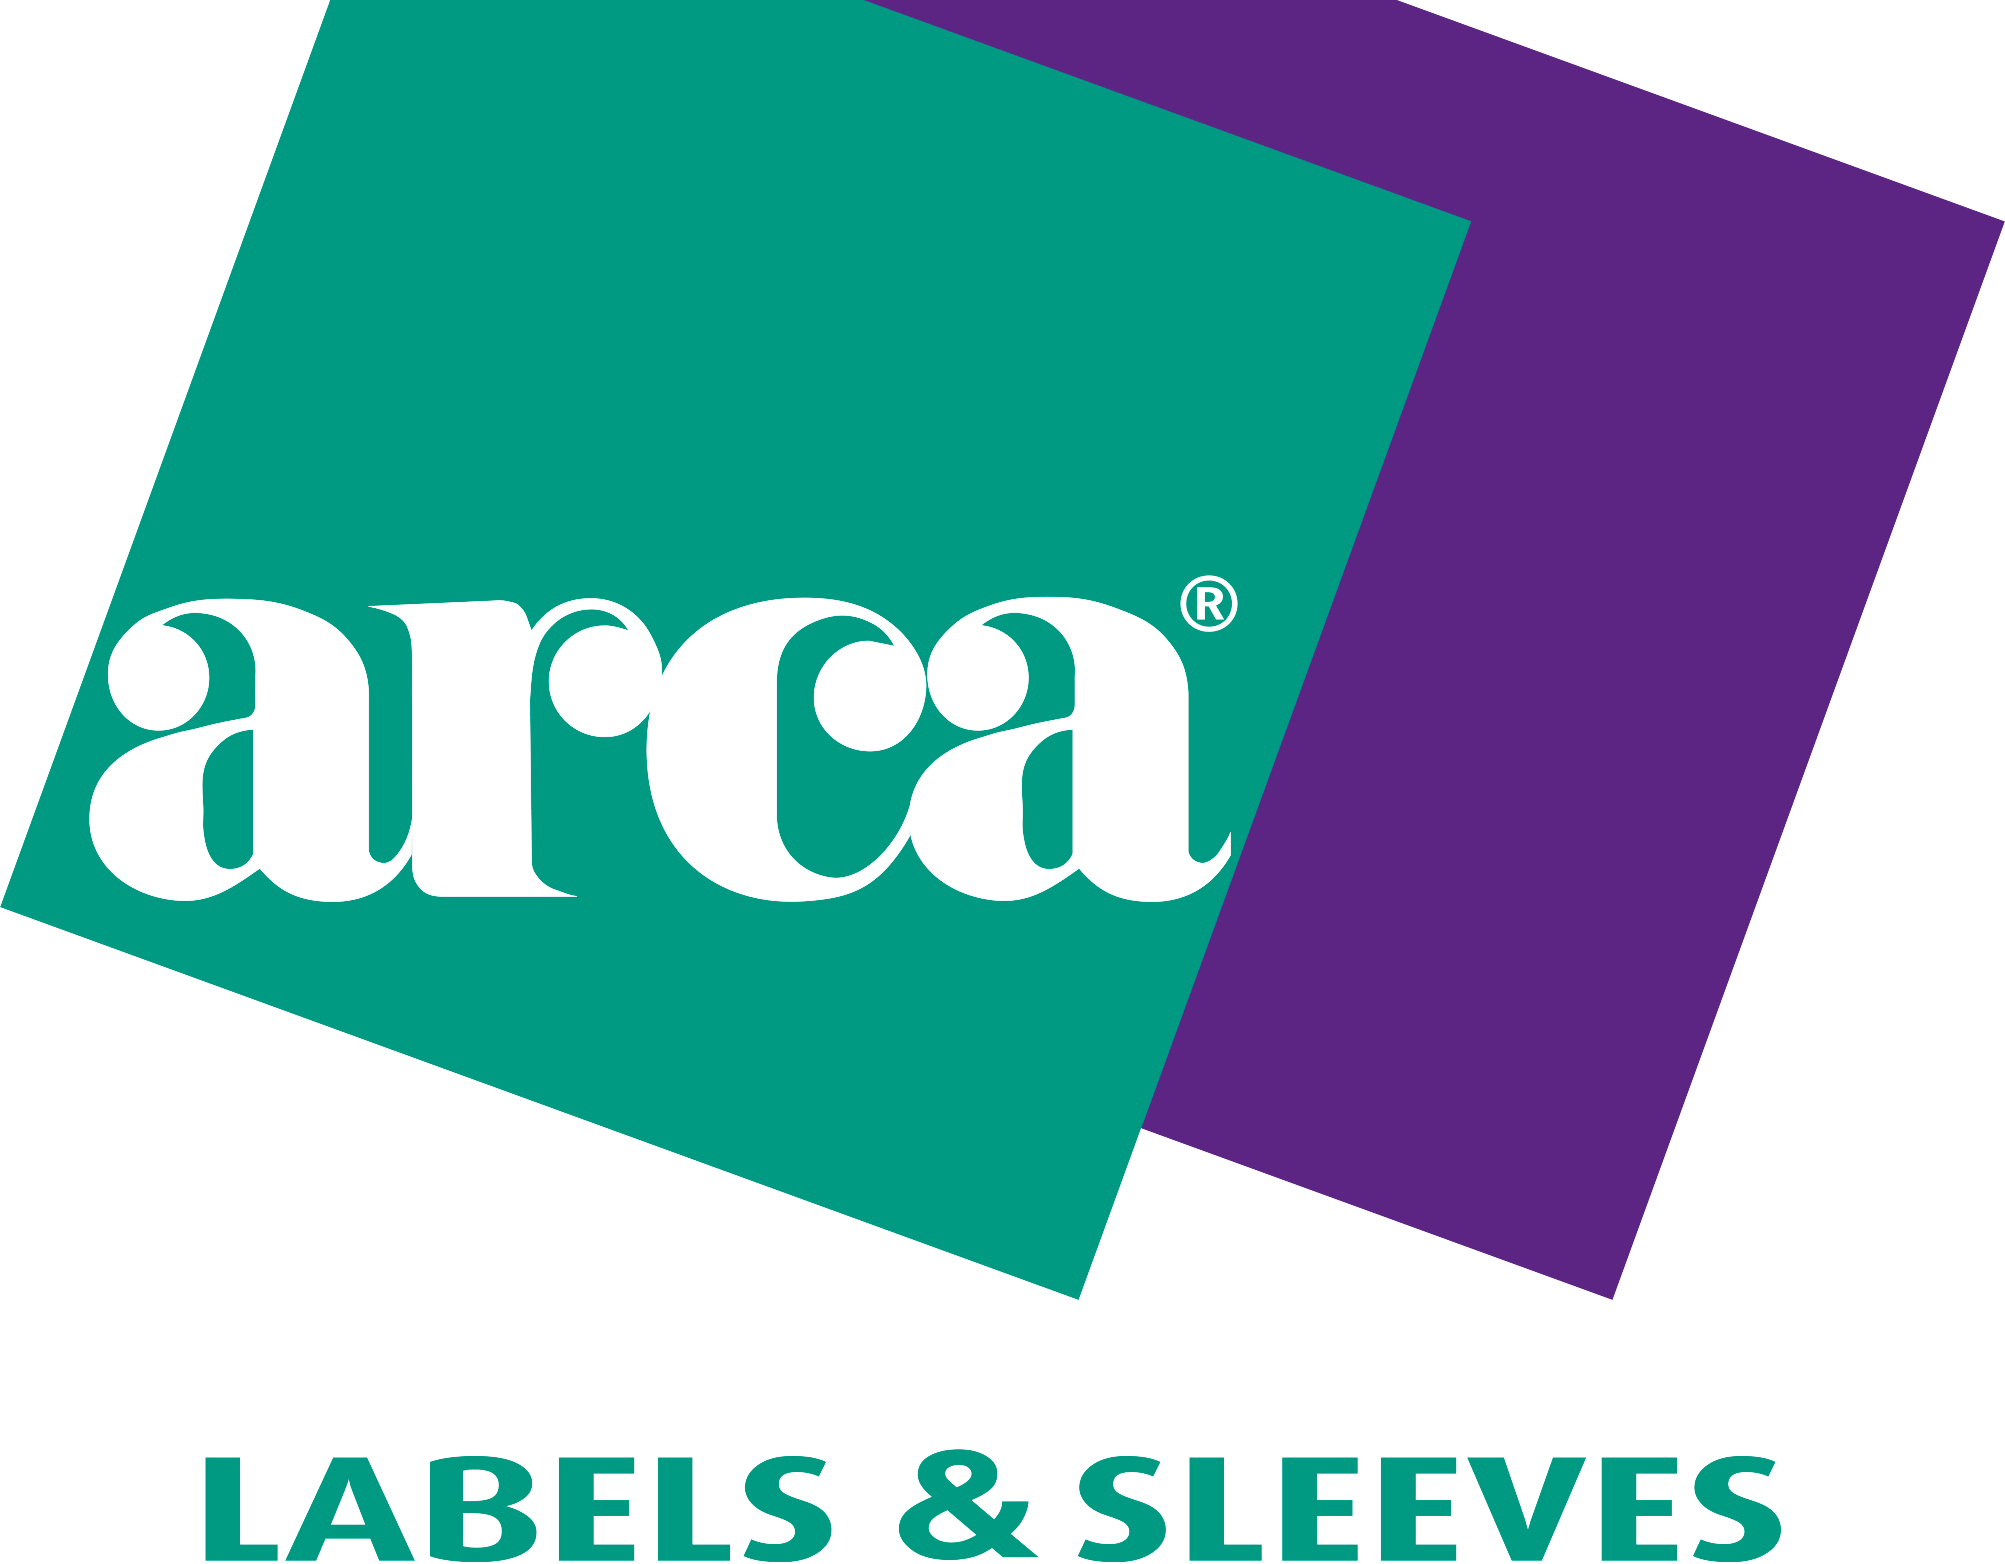 arca-group-etichette-etichettatura-labeling-80